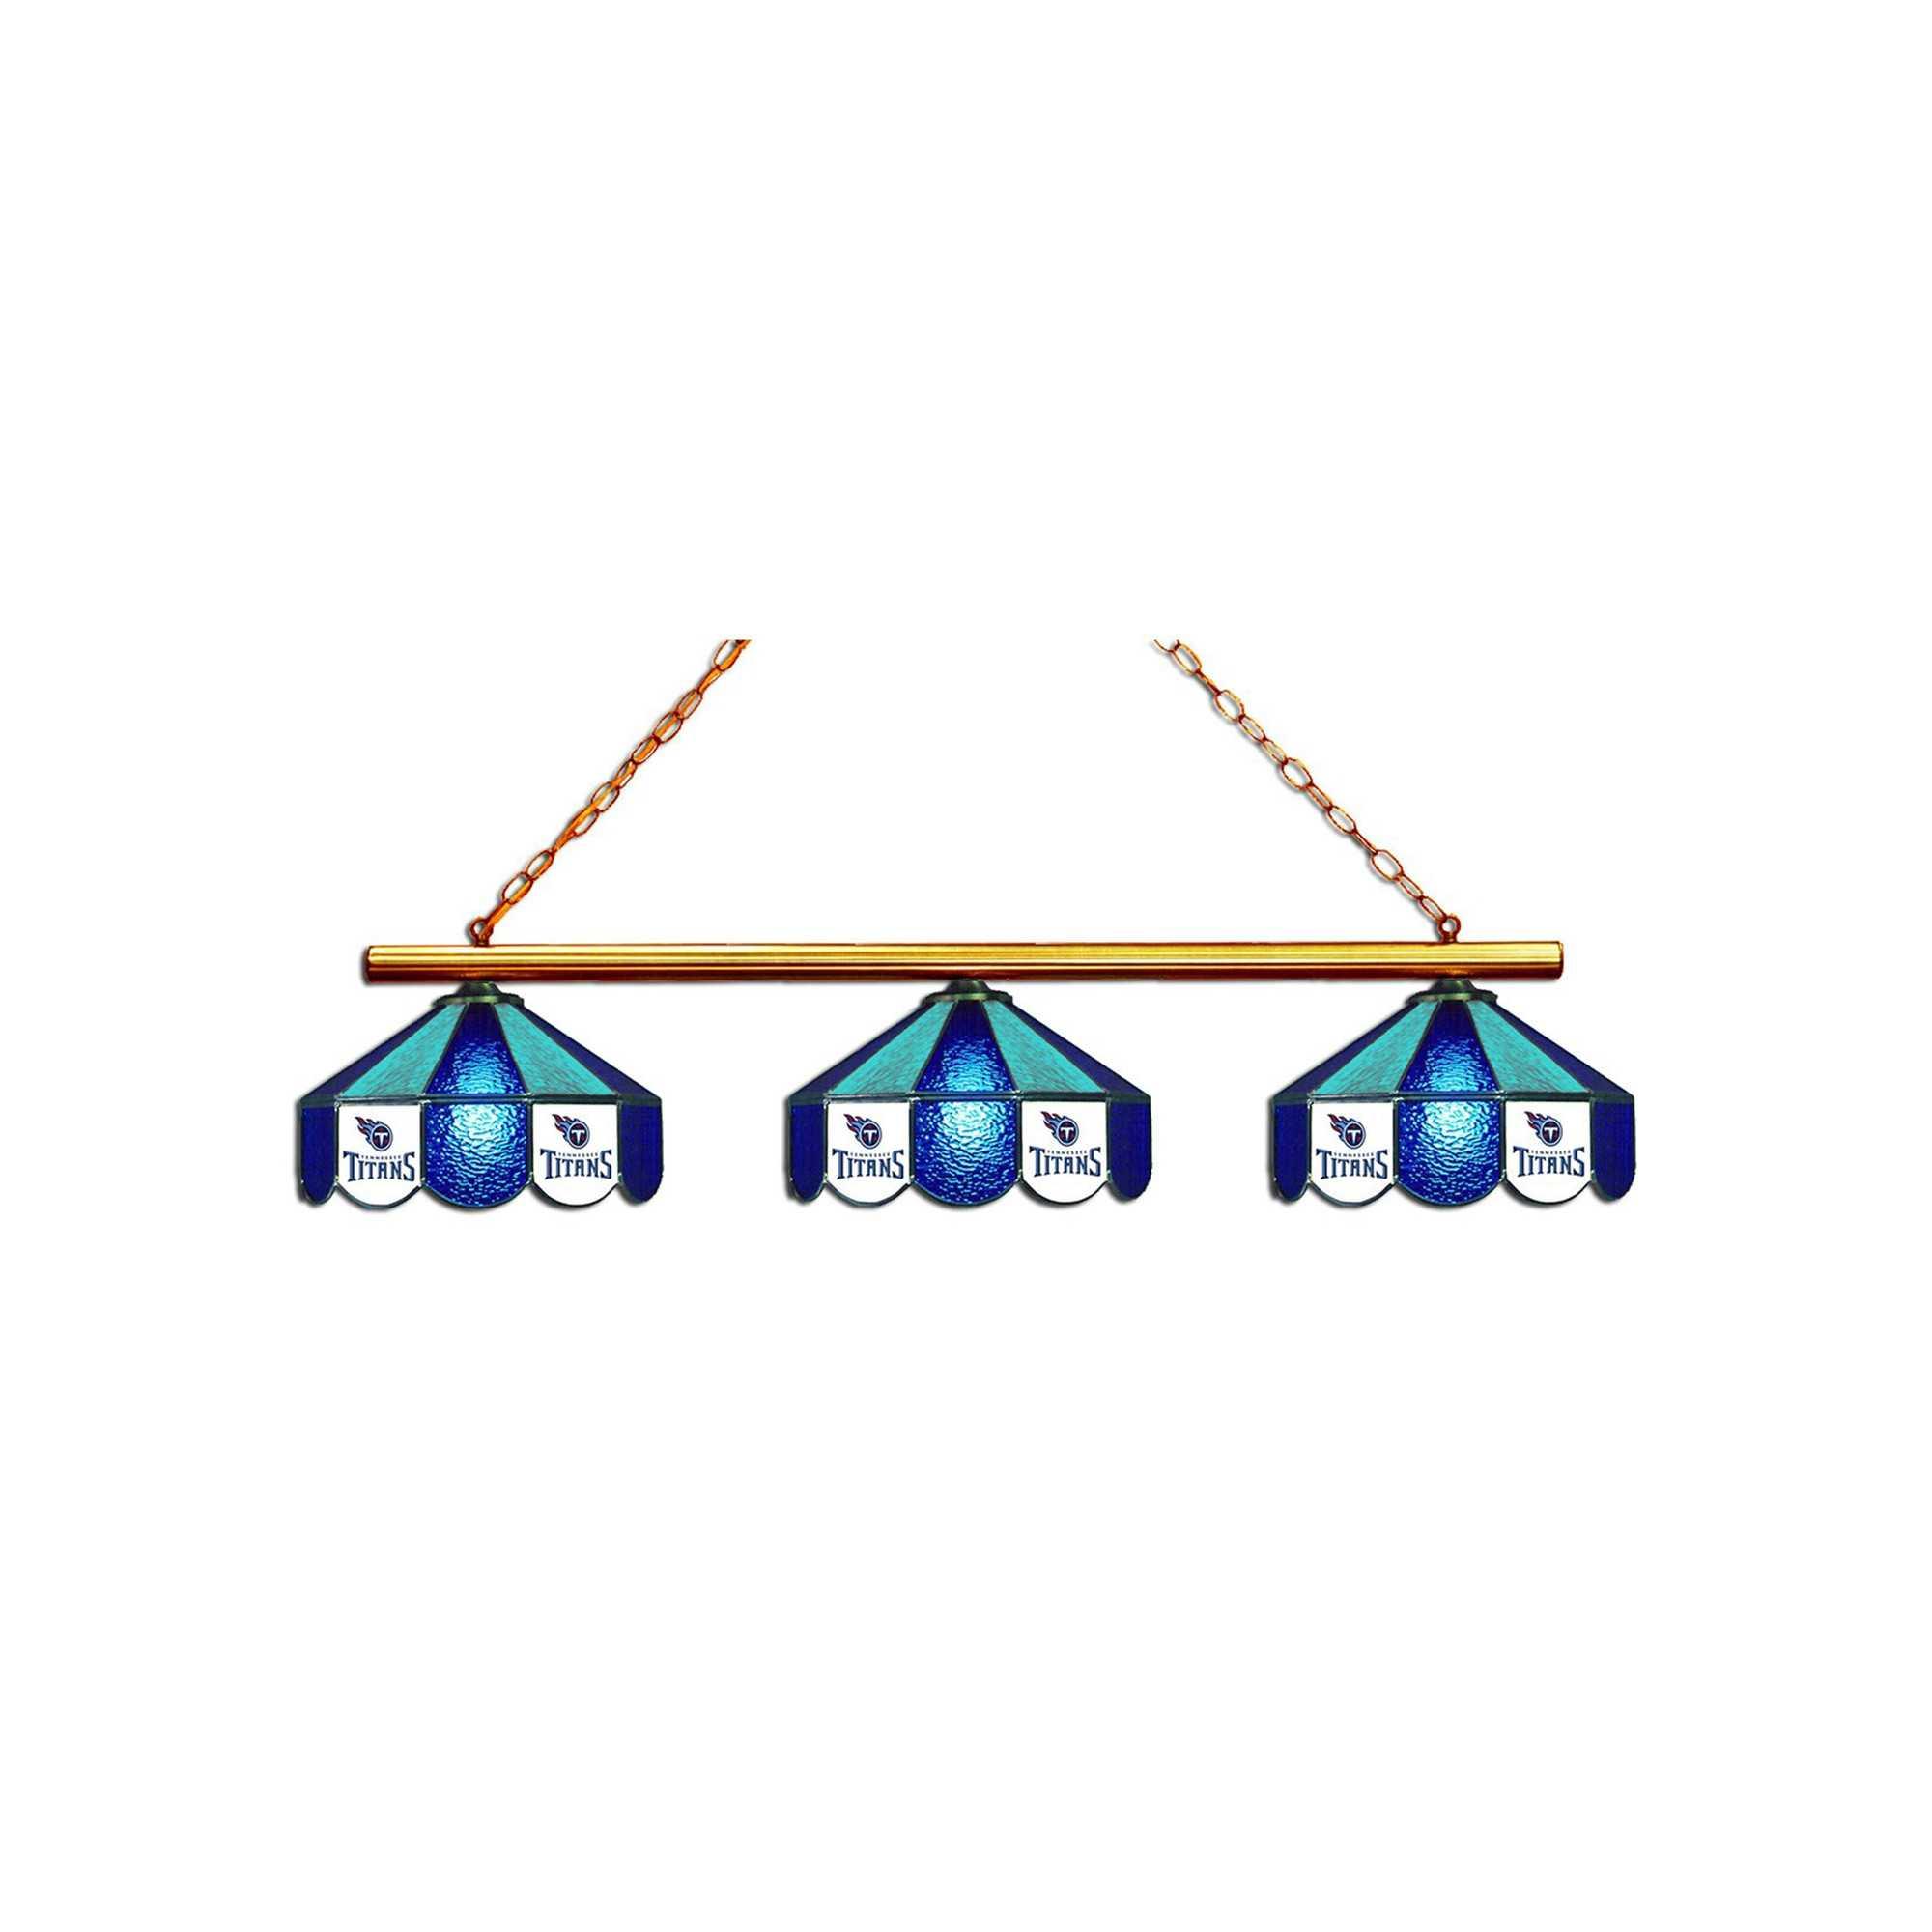 TENNESSEE TITANS GLASS 3 SHADE LAMP (BAR)